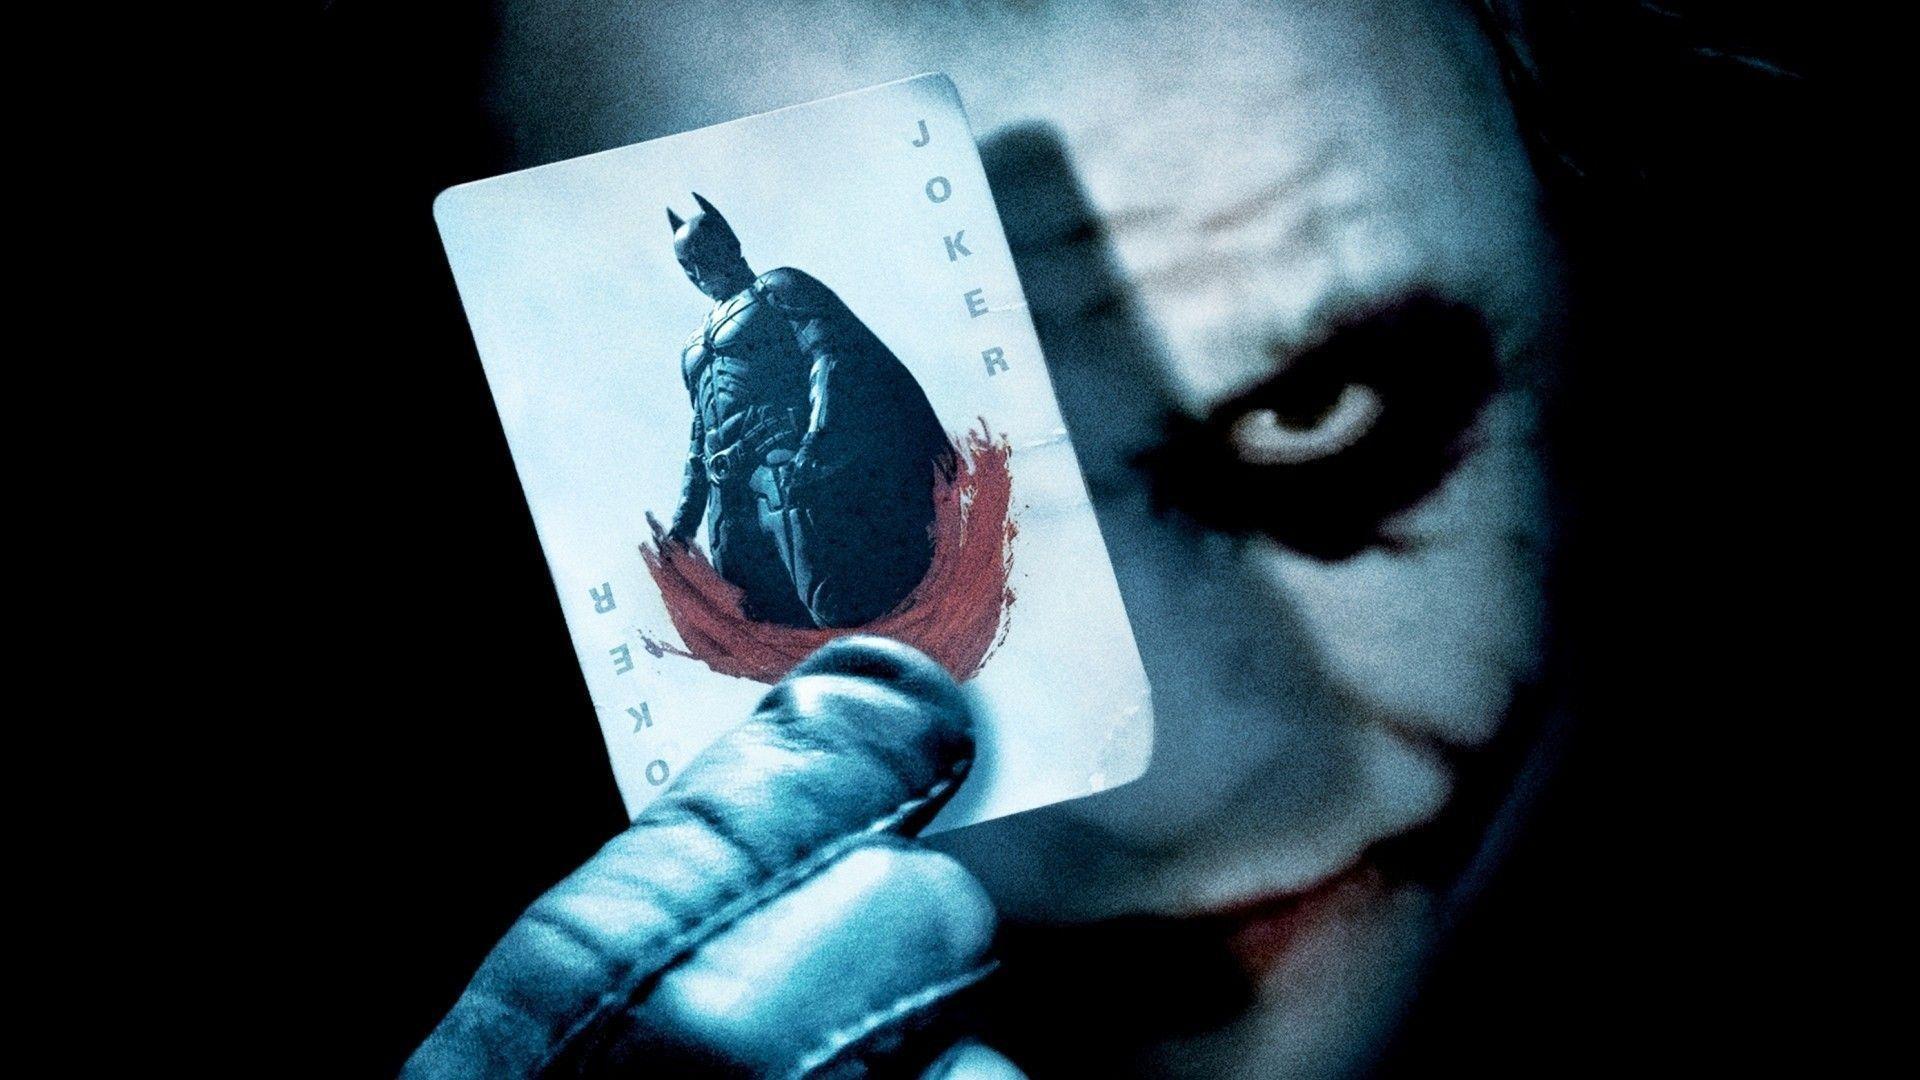 Pin By Flip Wallpapers Desktop On Fans Joker Joker Wallpaper Joker Hd Wallpaper Joker Images The dark knight joker wallpaper full hd